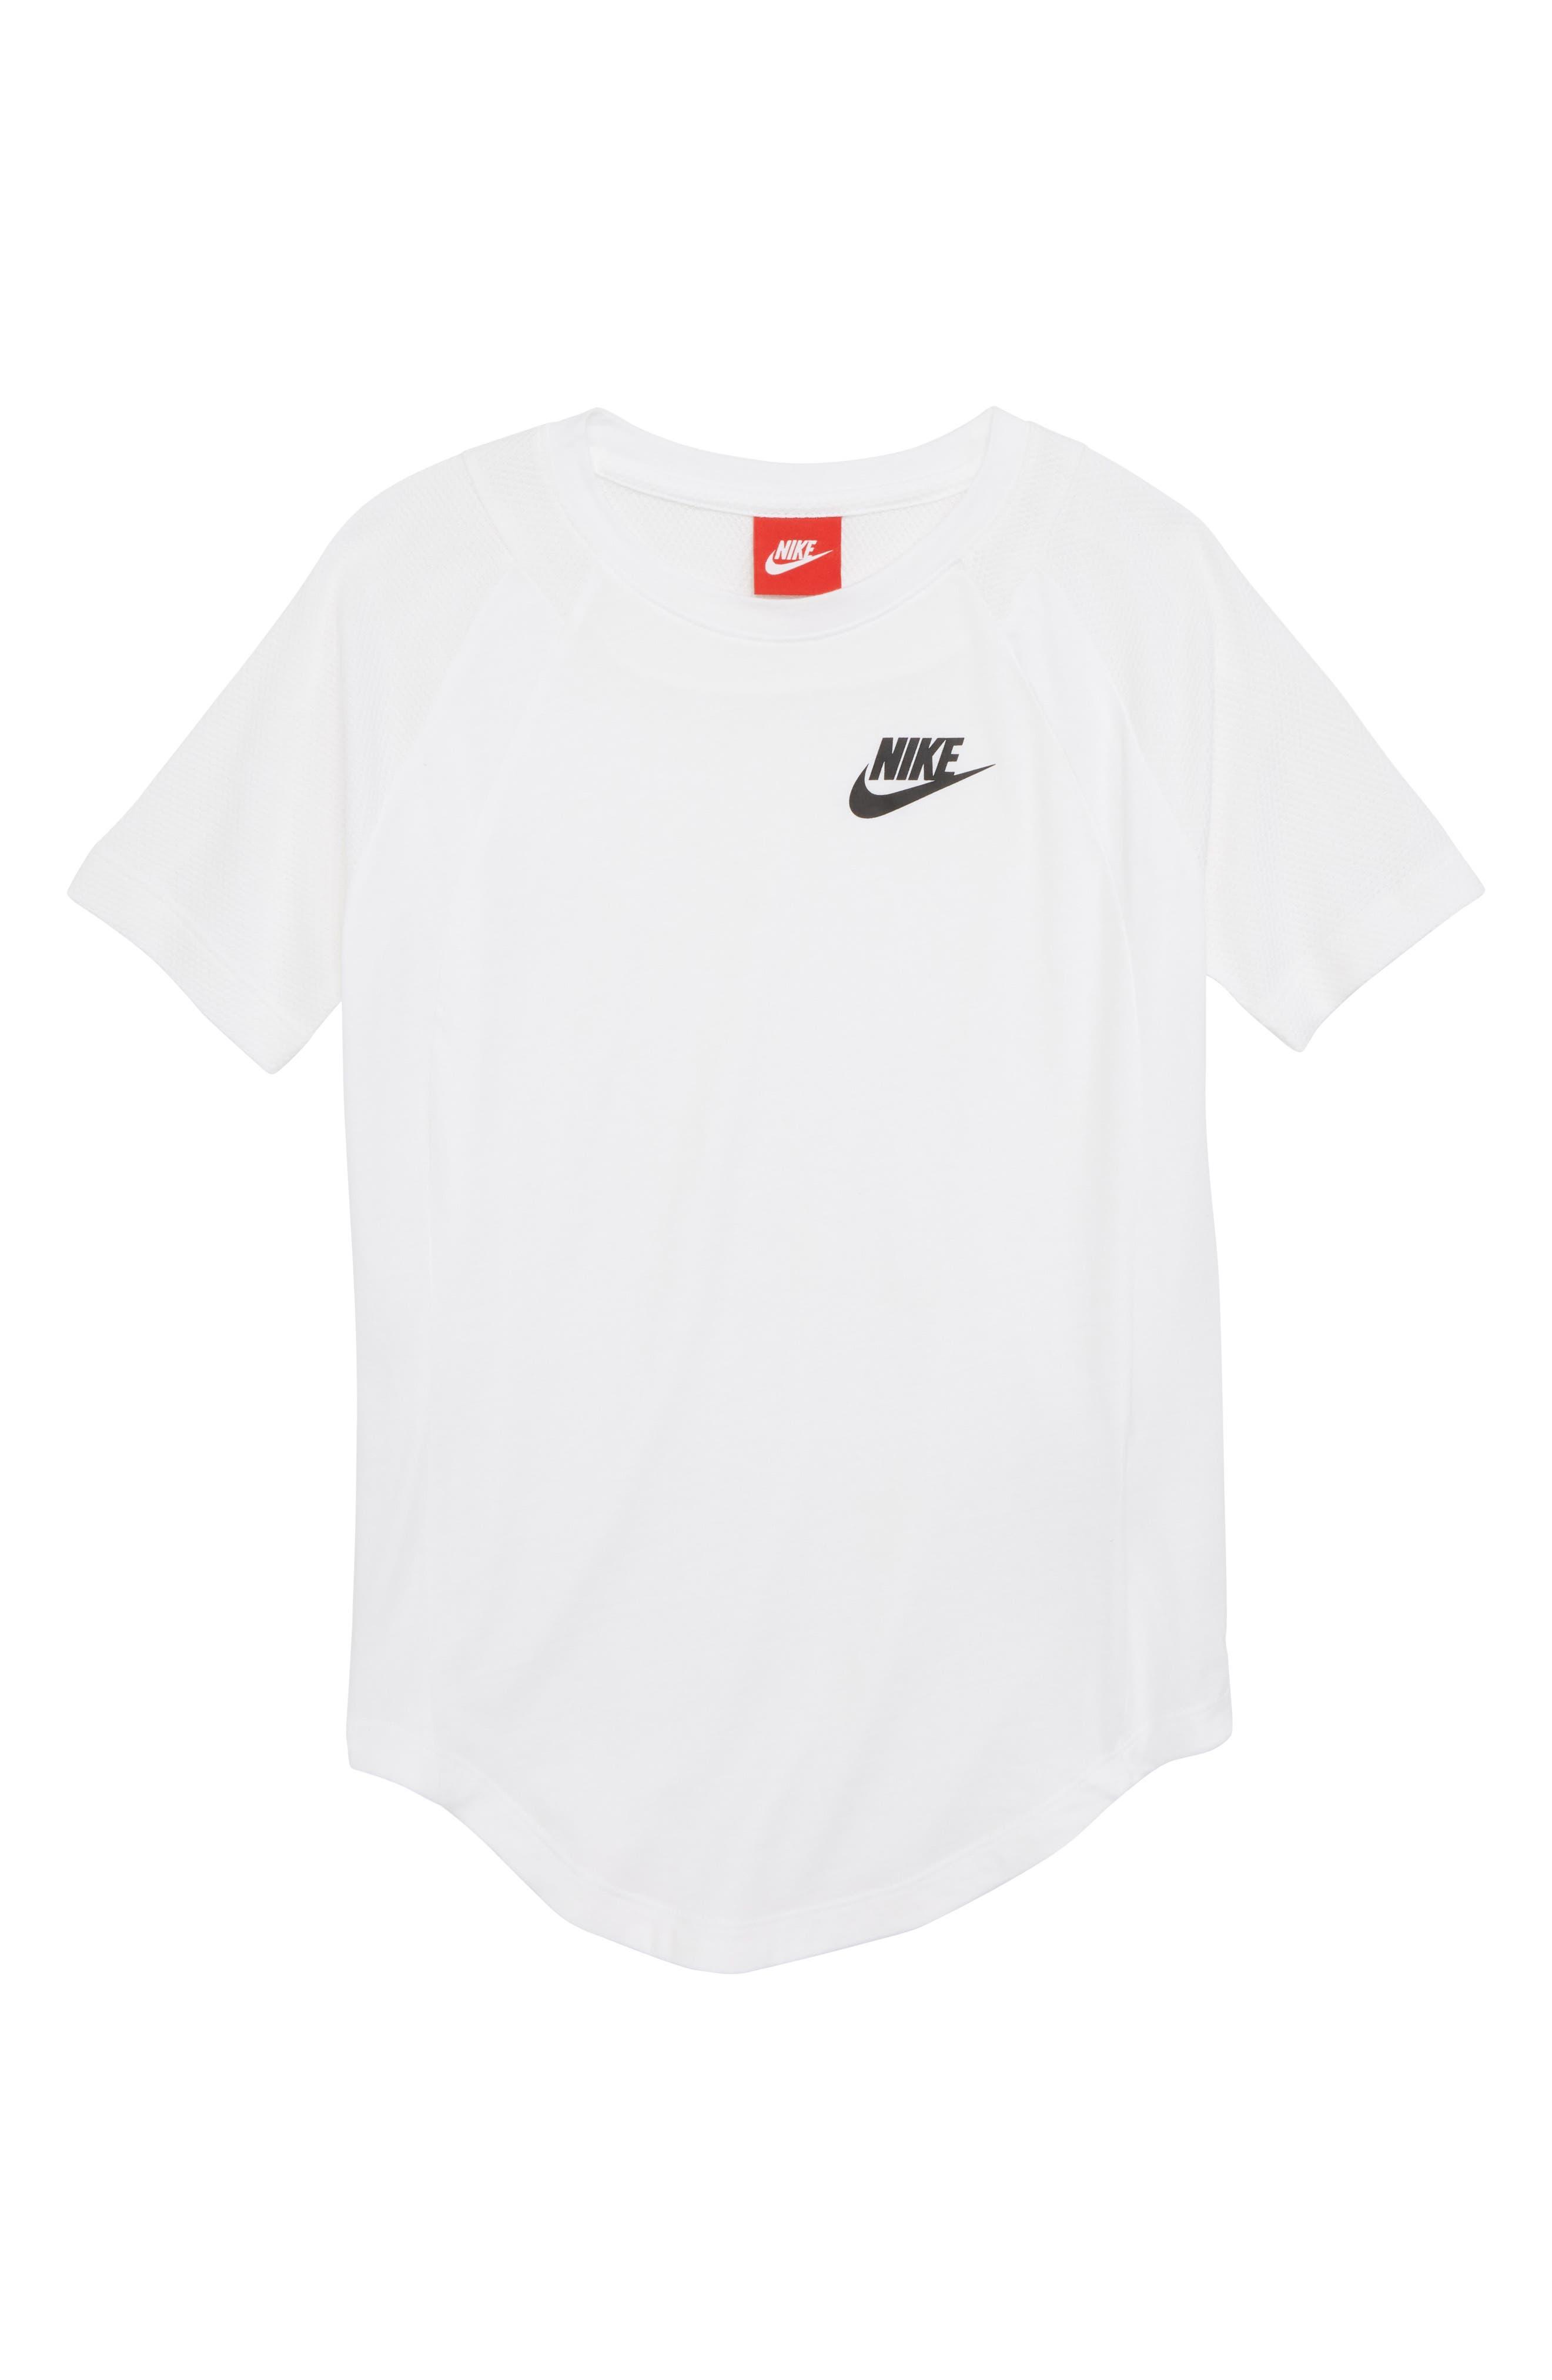 Sportswear Tee,                             Main thumbnail 1, color,                             White/ Black